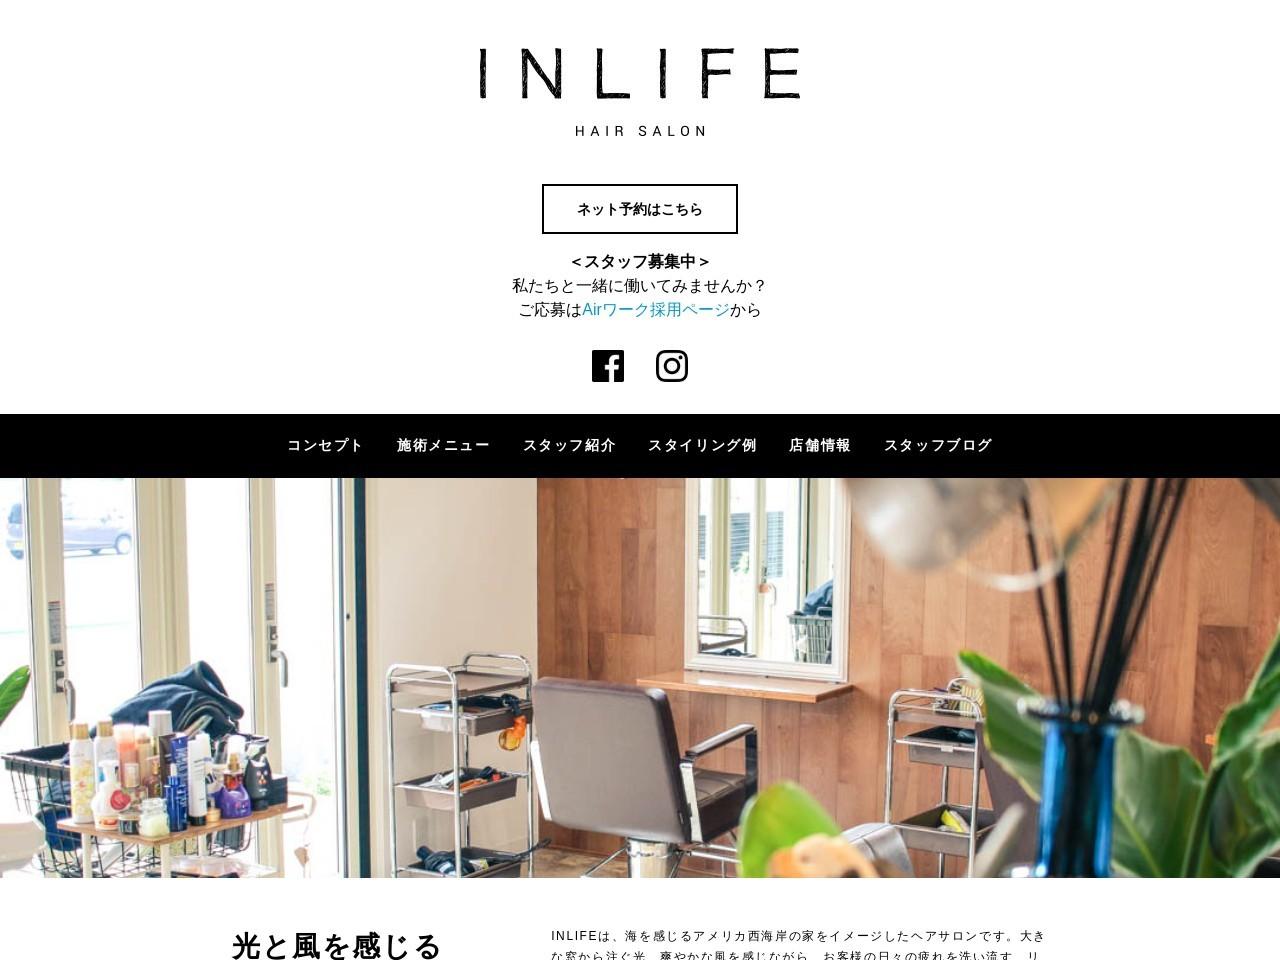 INLIFE HAIR SALON【インライフヘアサロン】